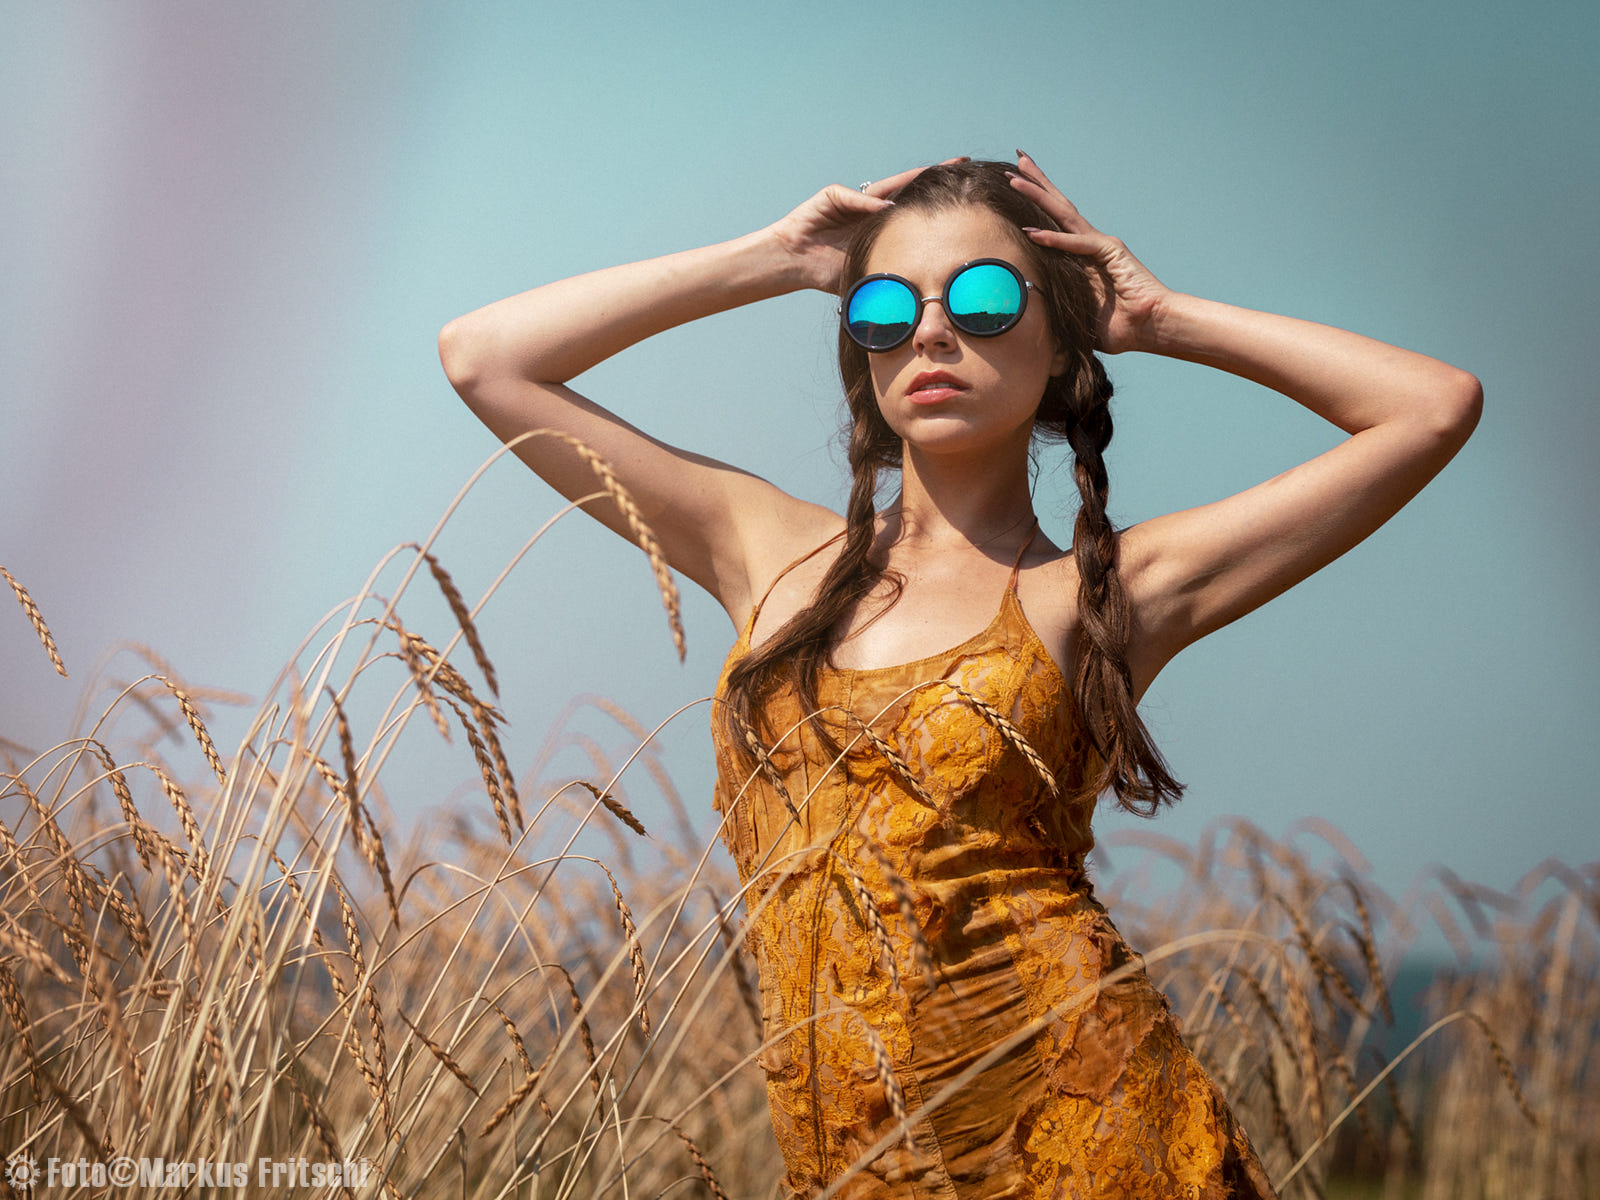 aleksa slusarchi women model 500px markus fritschi sunglasses